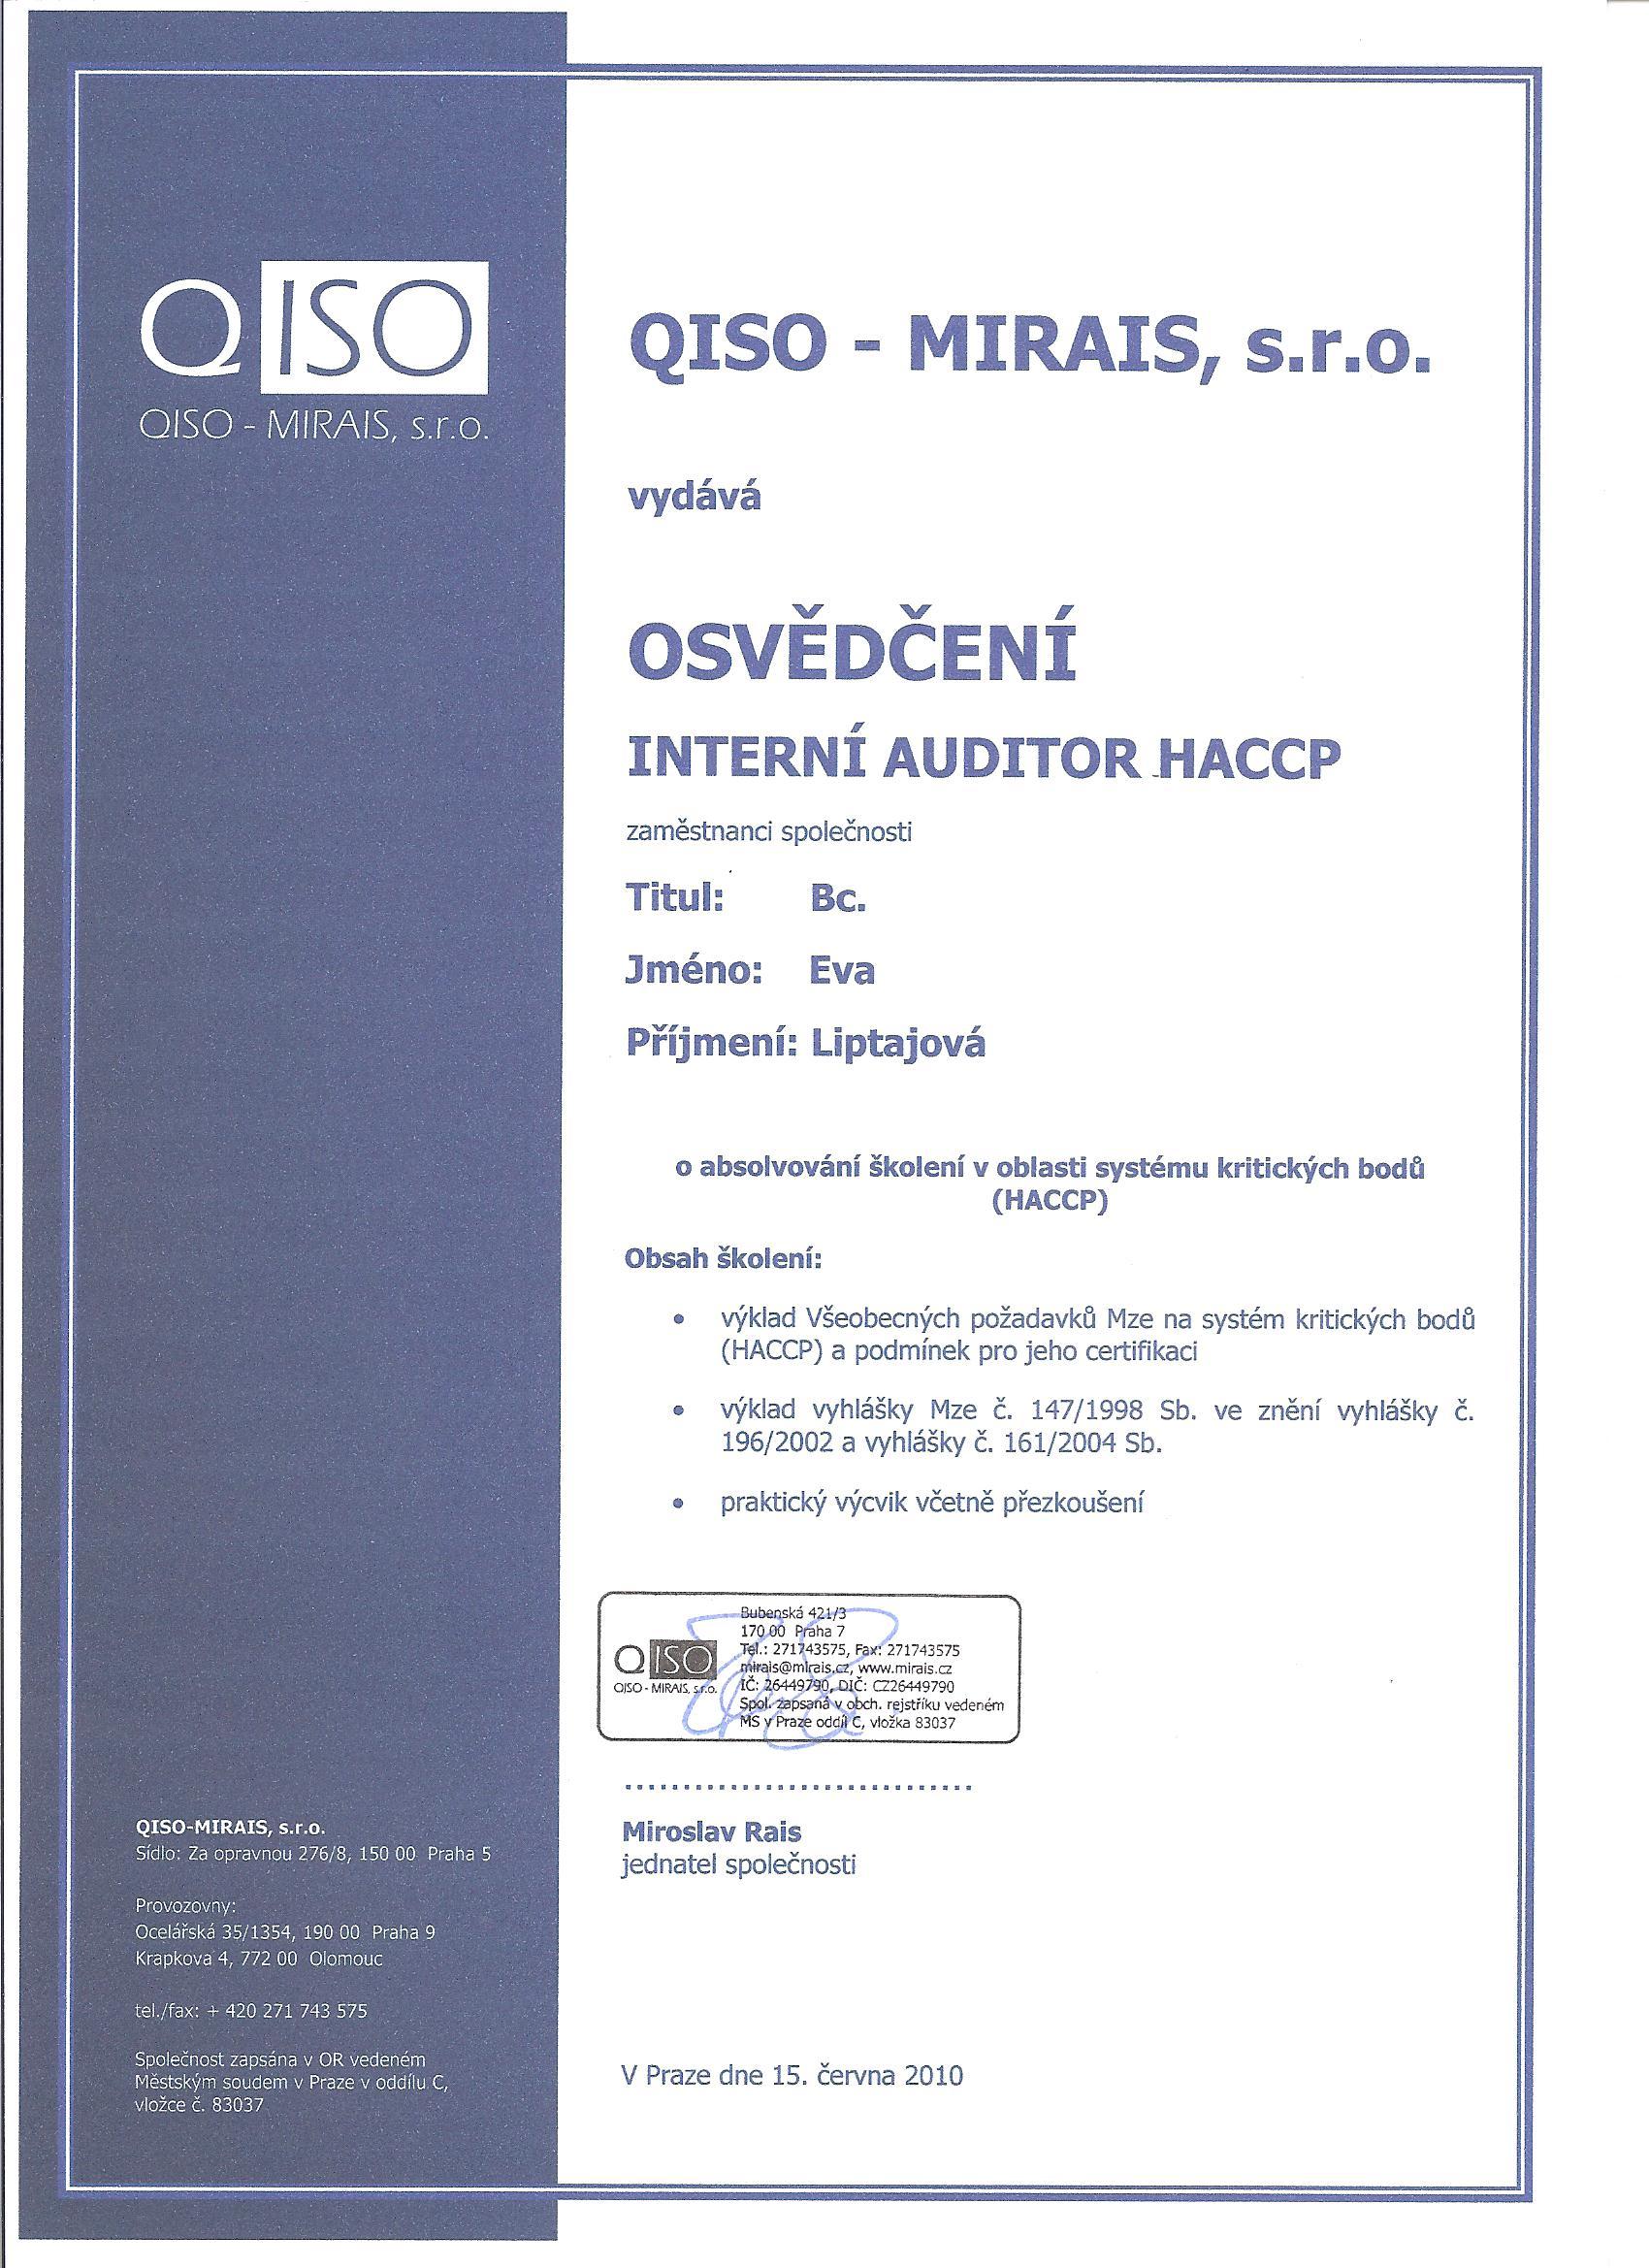 Liptajova_E_OSV_HACCP 001.jpg